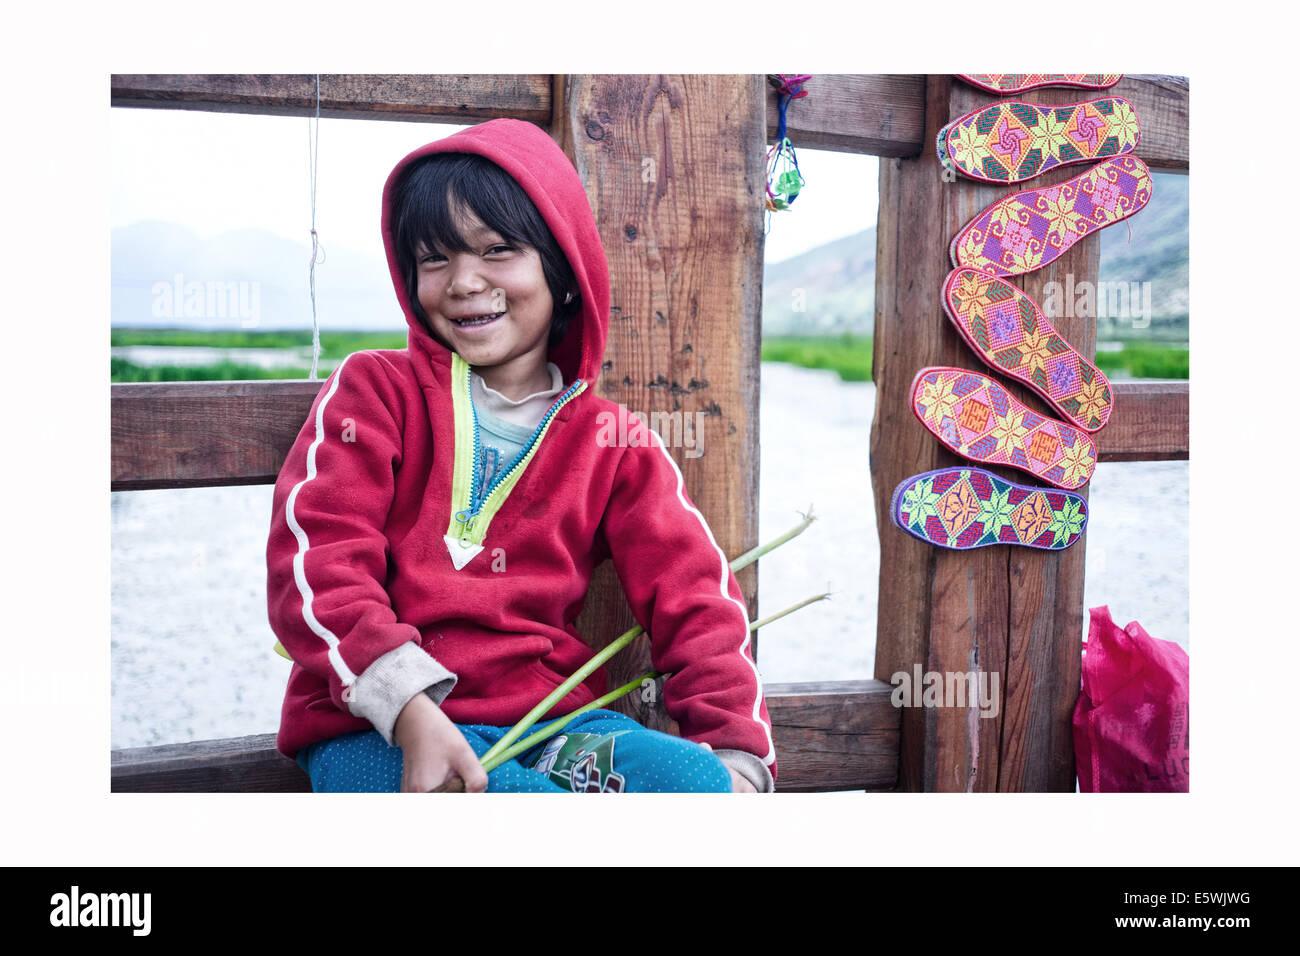 Julio 30, 2014 - LIJIANG CHINA de Julio 30: Nakhi protrait de gente durante el viaje del fotógrafo de Lijiang, provincia de Yunnan, en China. © SIPA Asia/Zuma alambre/Alamy Live News Foto de stock